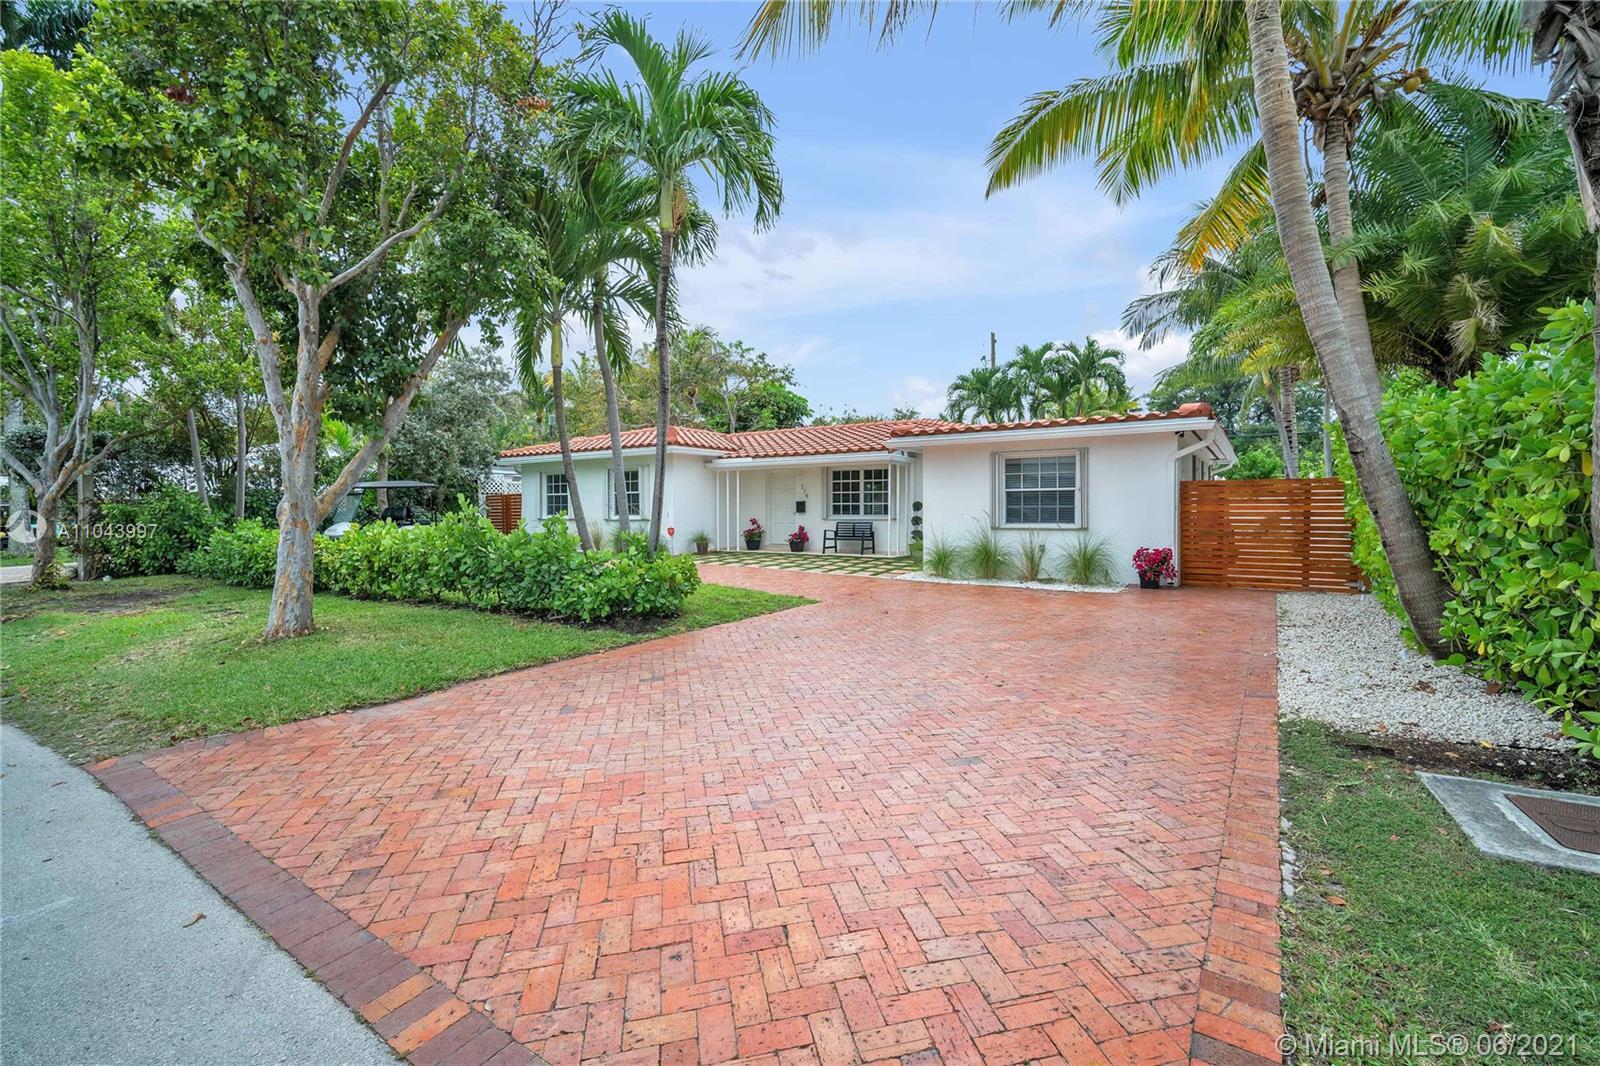 Biscayne Key Estates - 774 Fernwood Rd, Key Biscayne, FL 33149